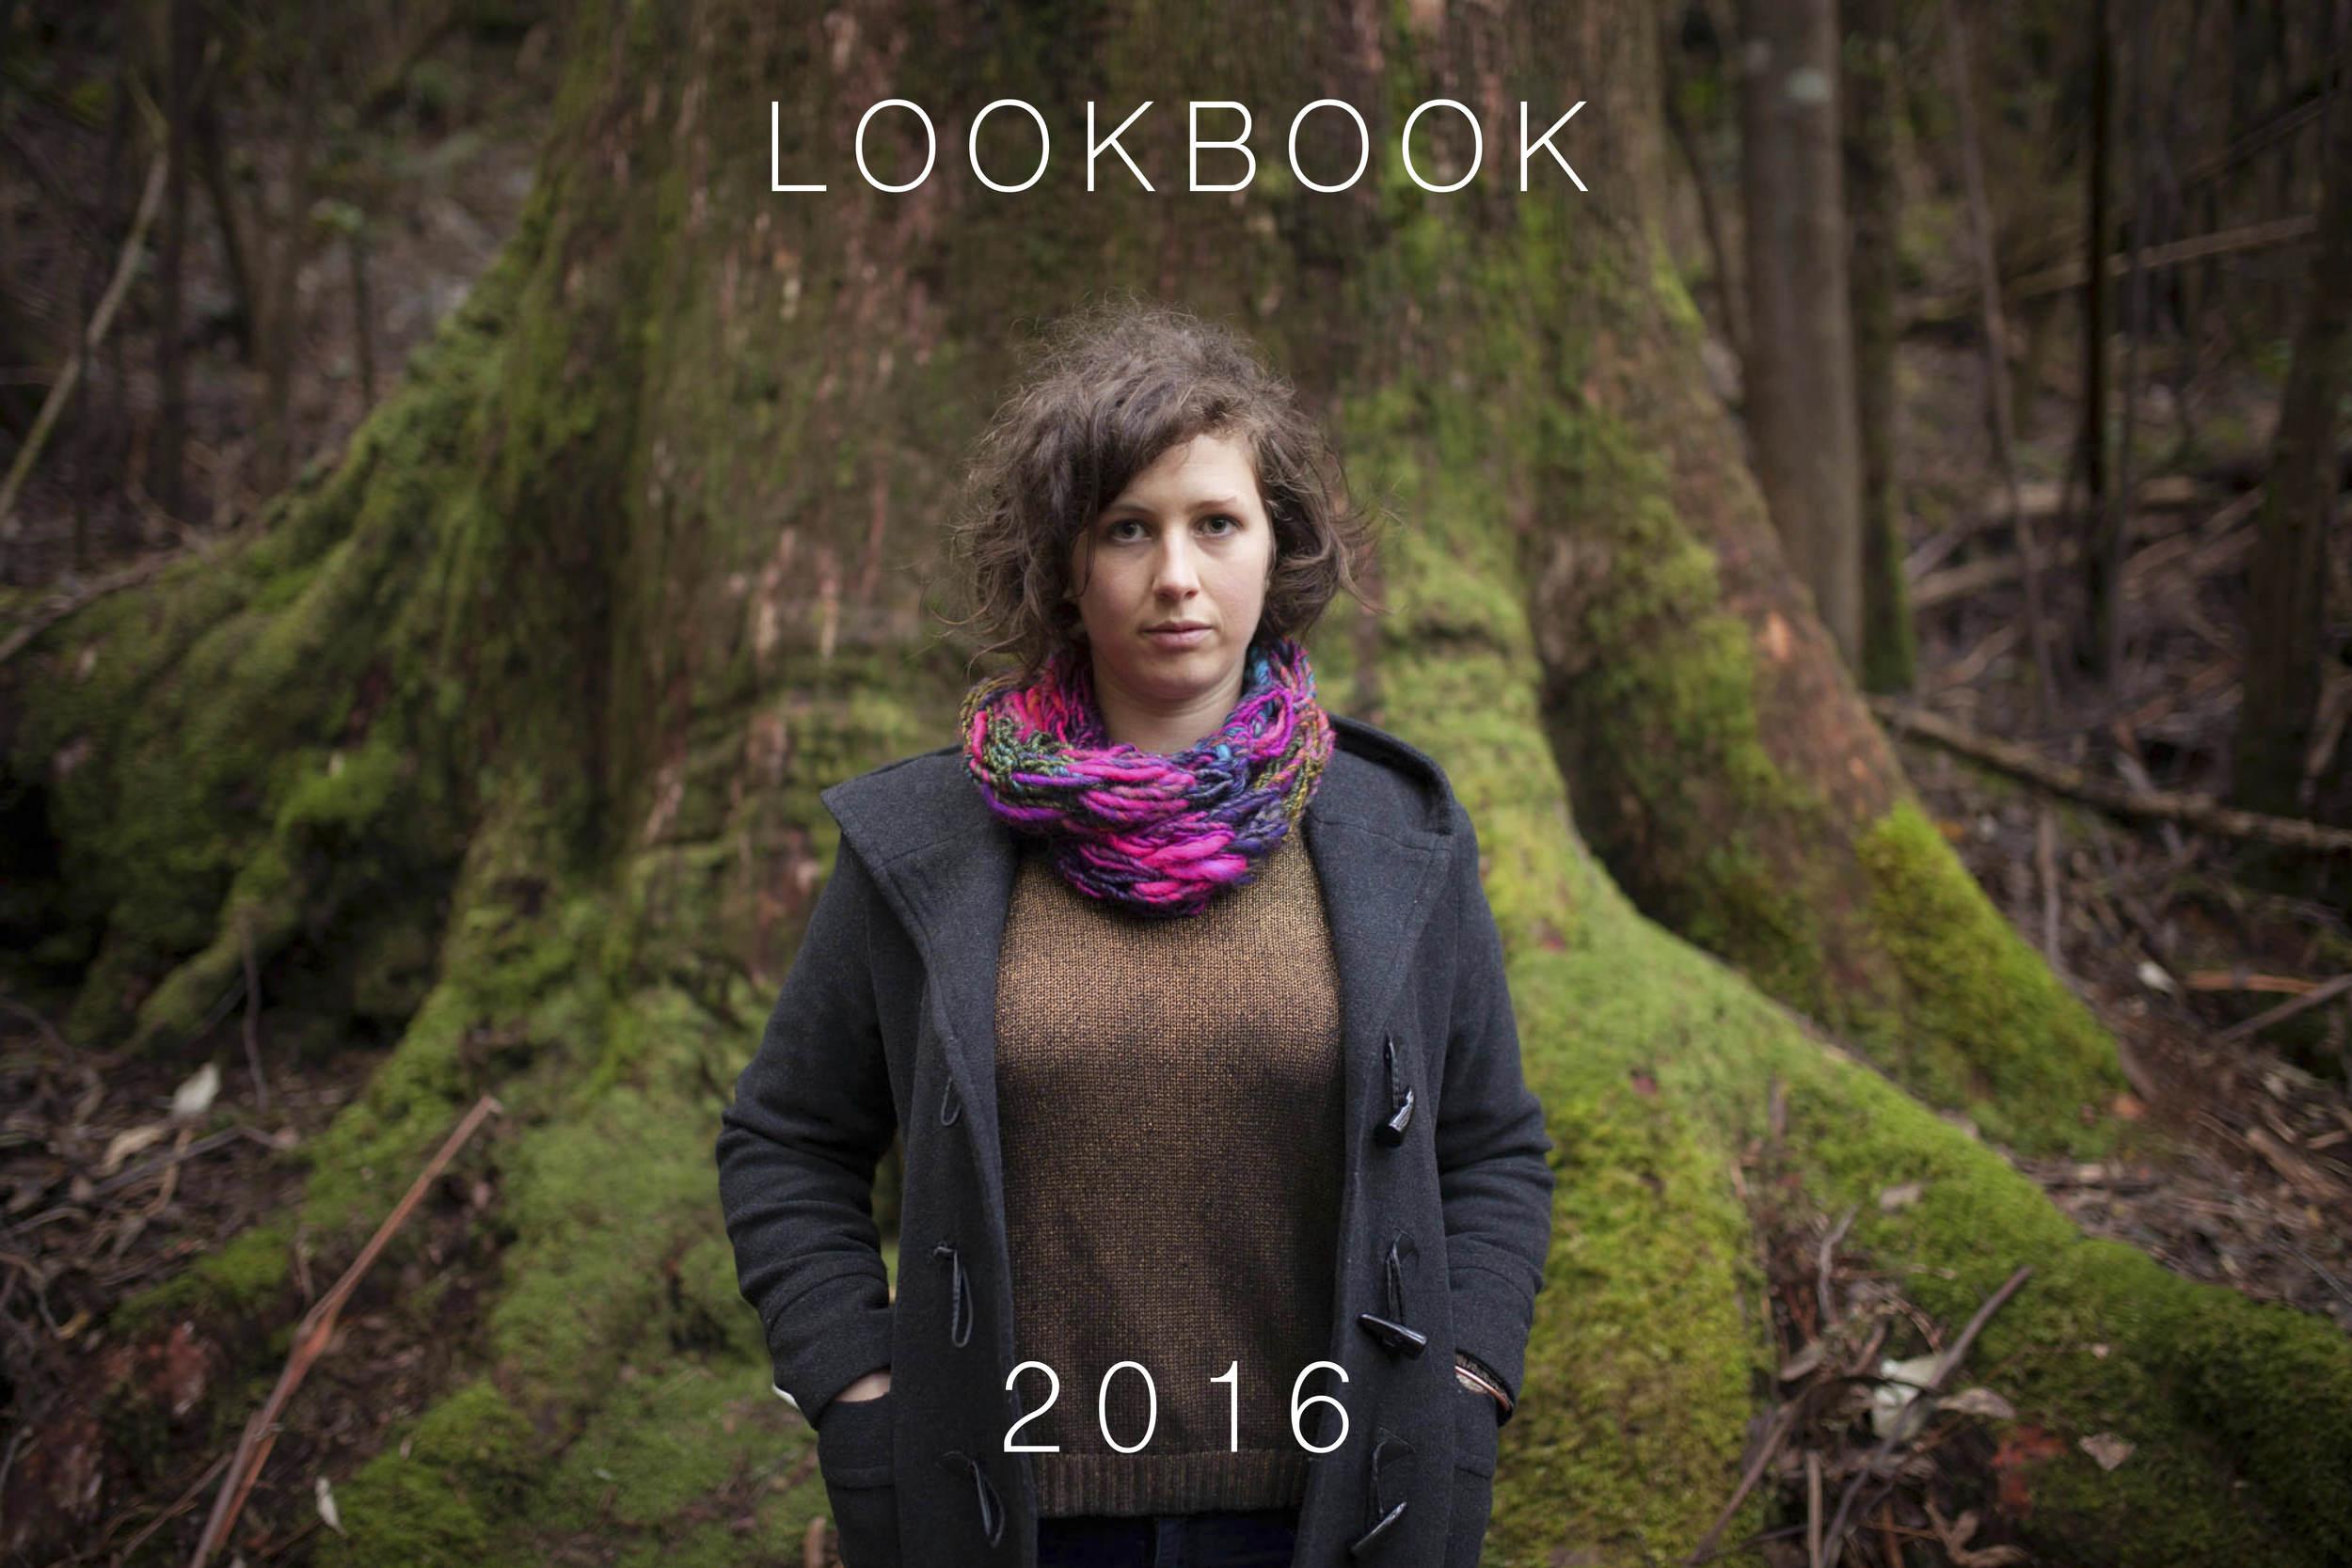 lookbook cover.jpg